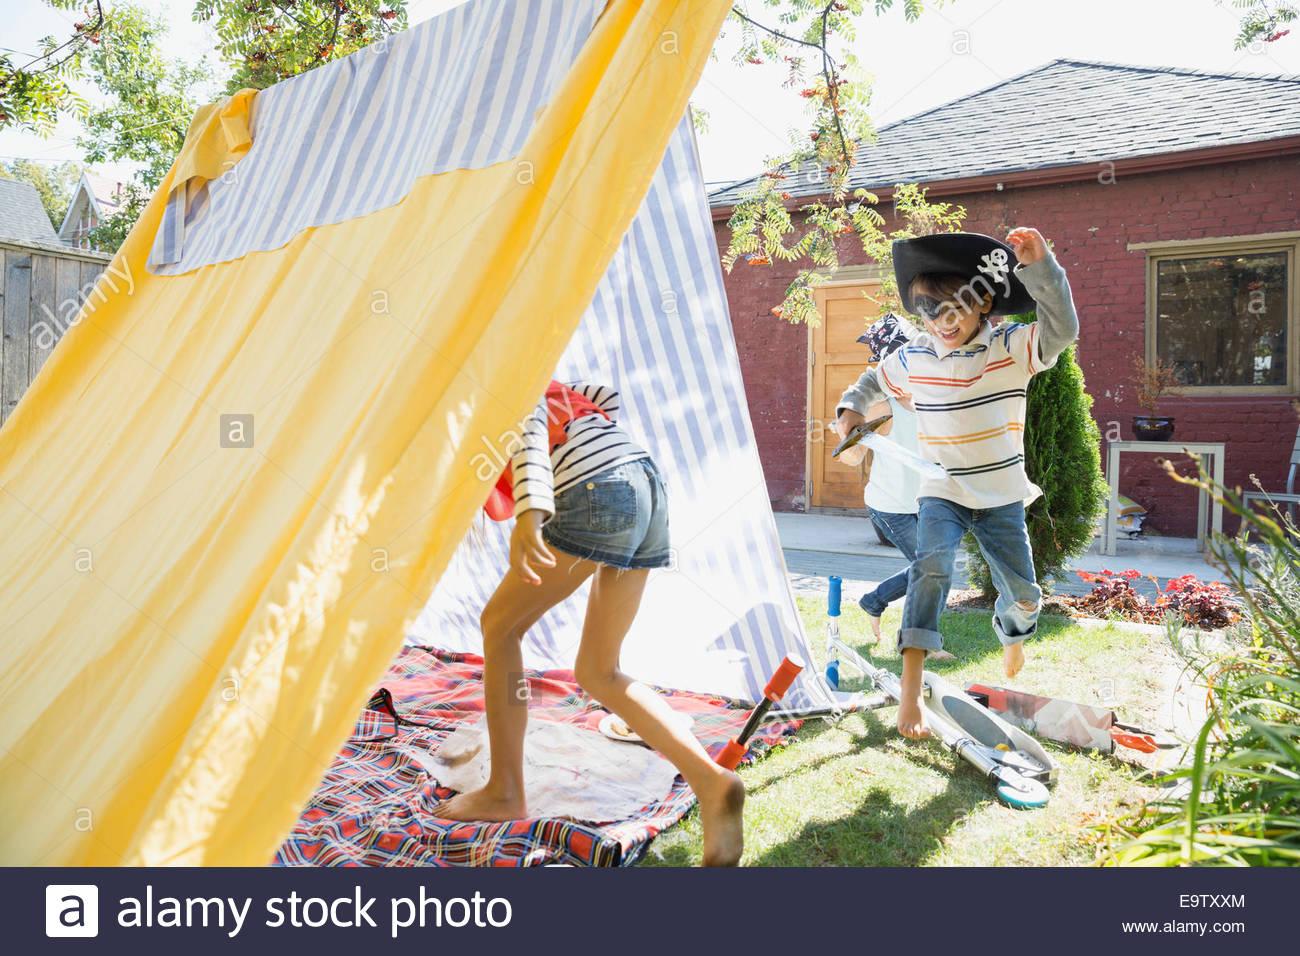 Children playing pirates in backyard fort - Stock Image